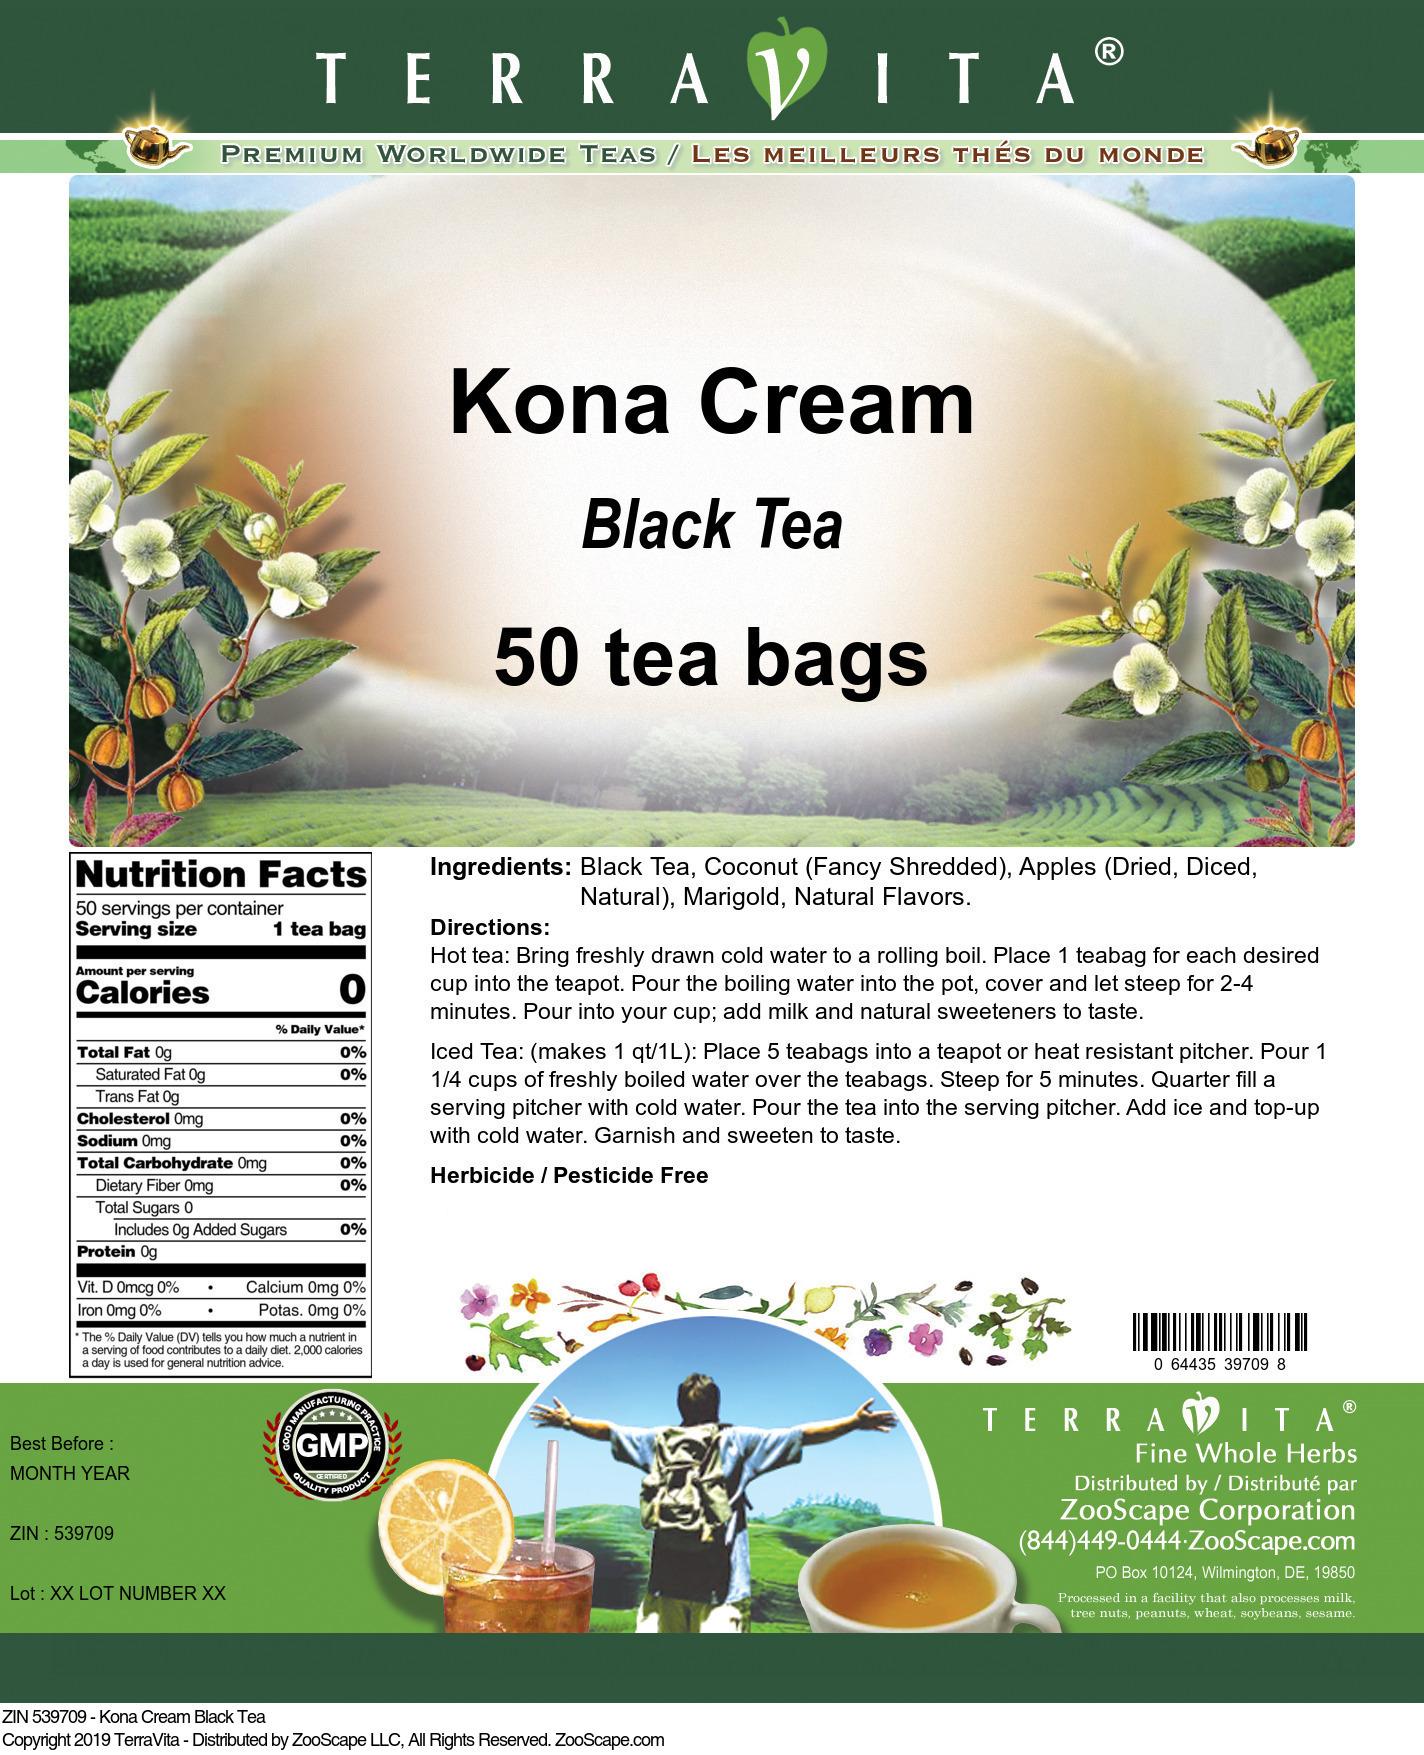 Kona Cream Black Tea